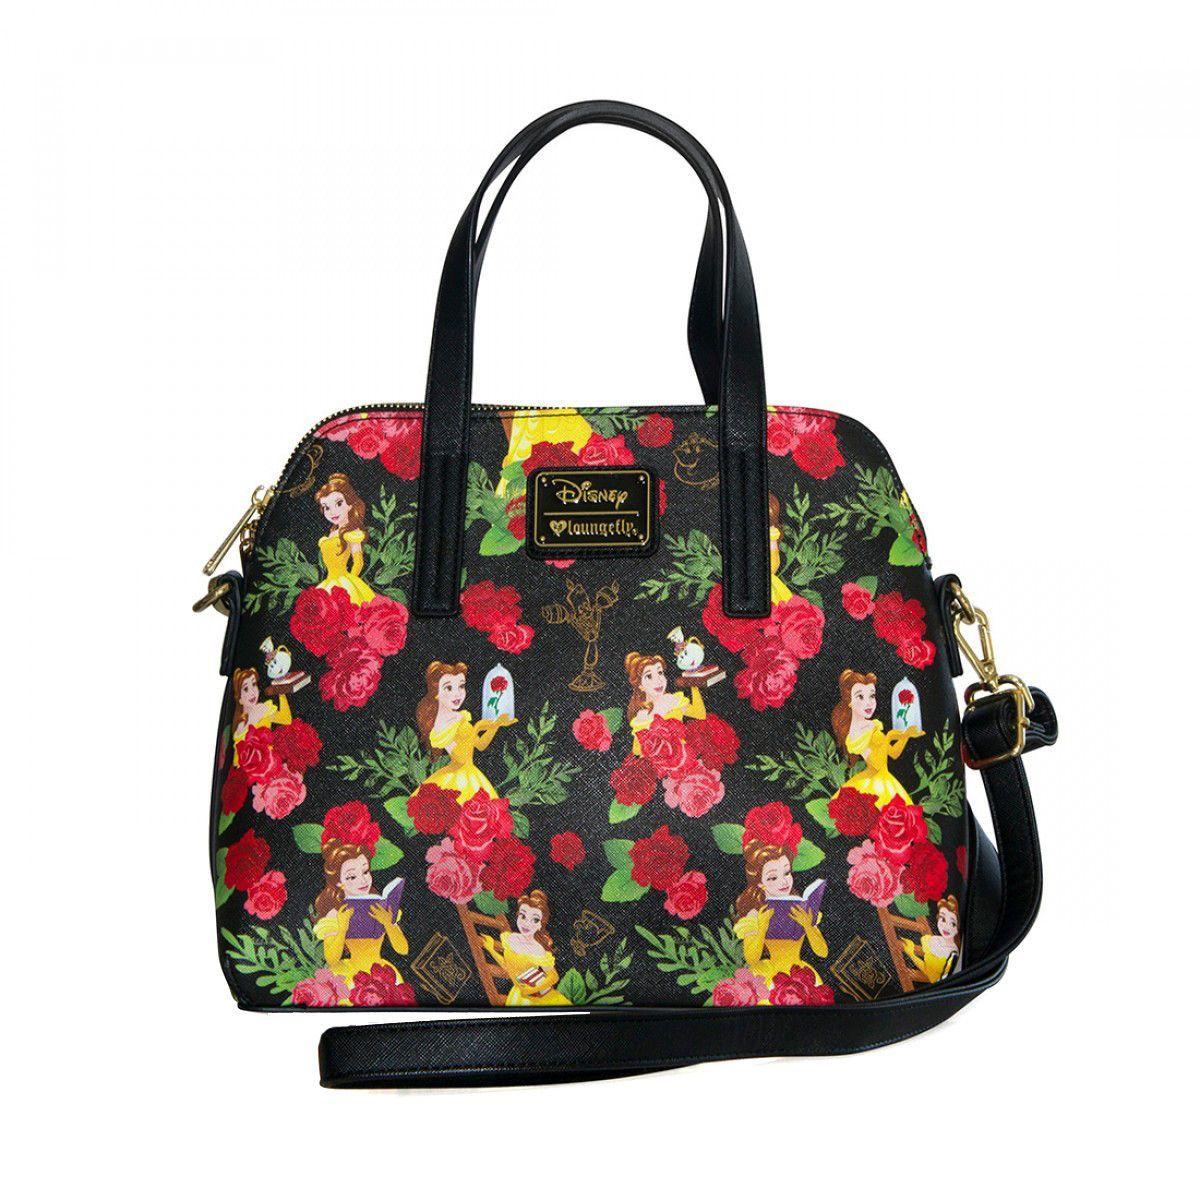 Princess Belle Disney Loungefly Floral AOP Handbag Purse